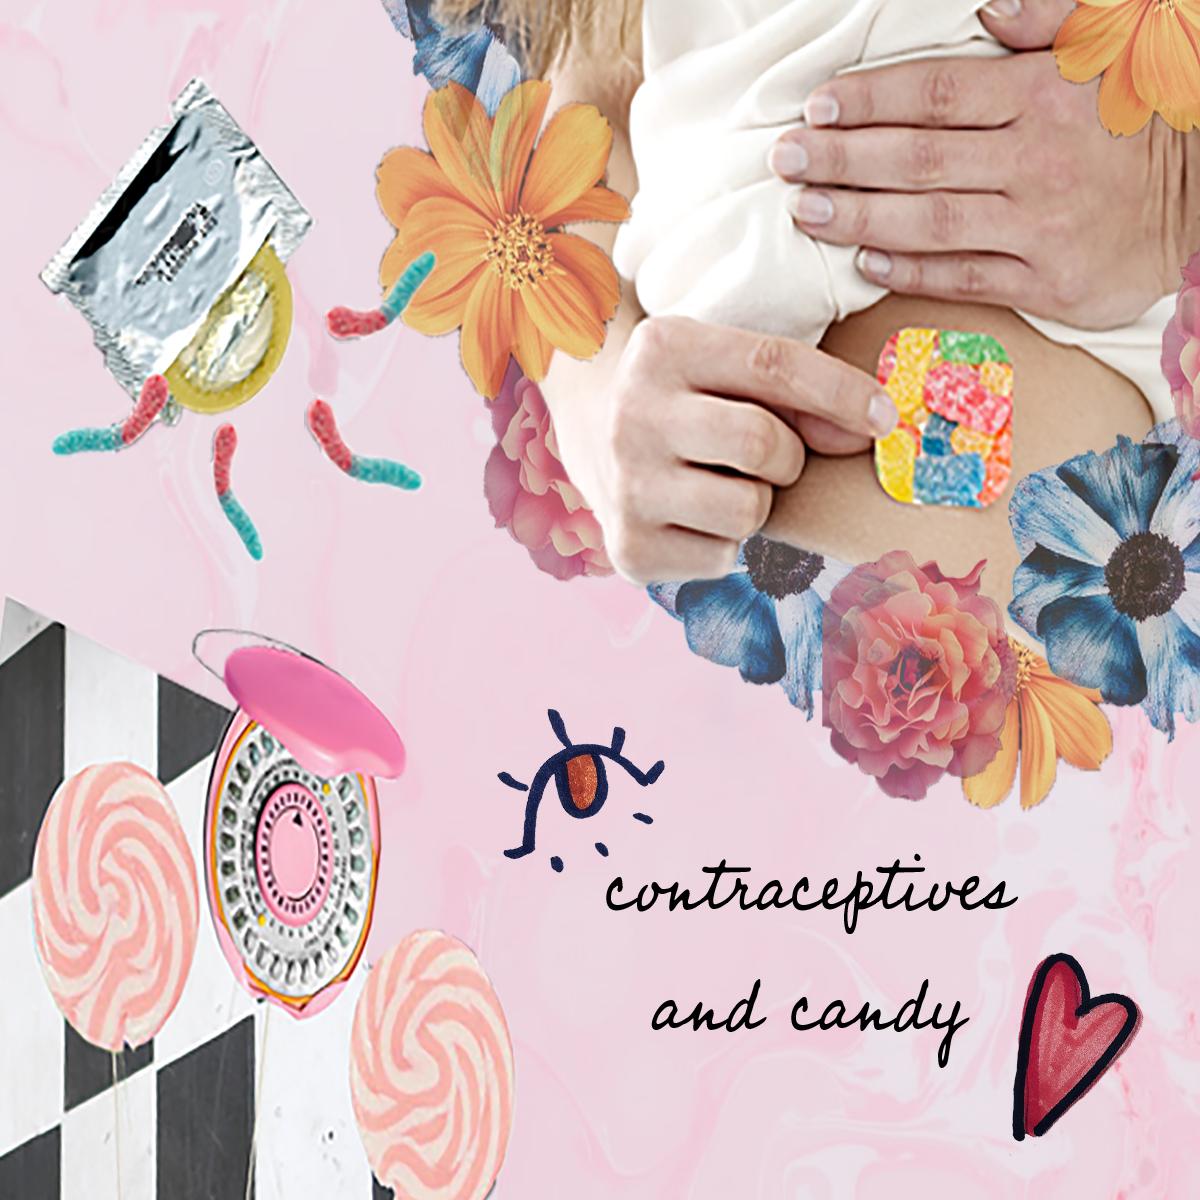 Maura-Sheedy-ContraceptivesAndCandy.png